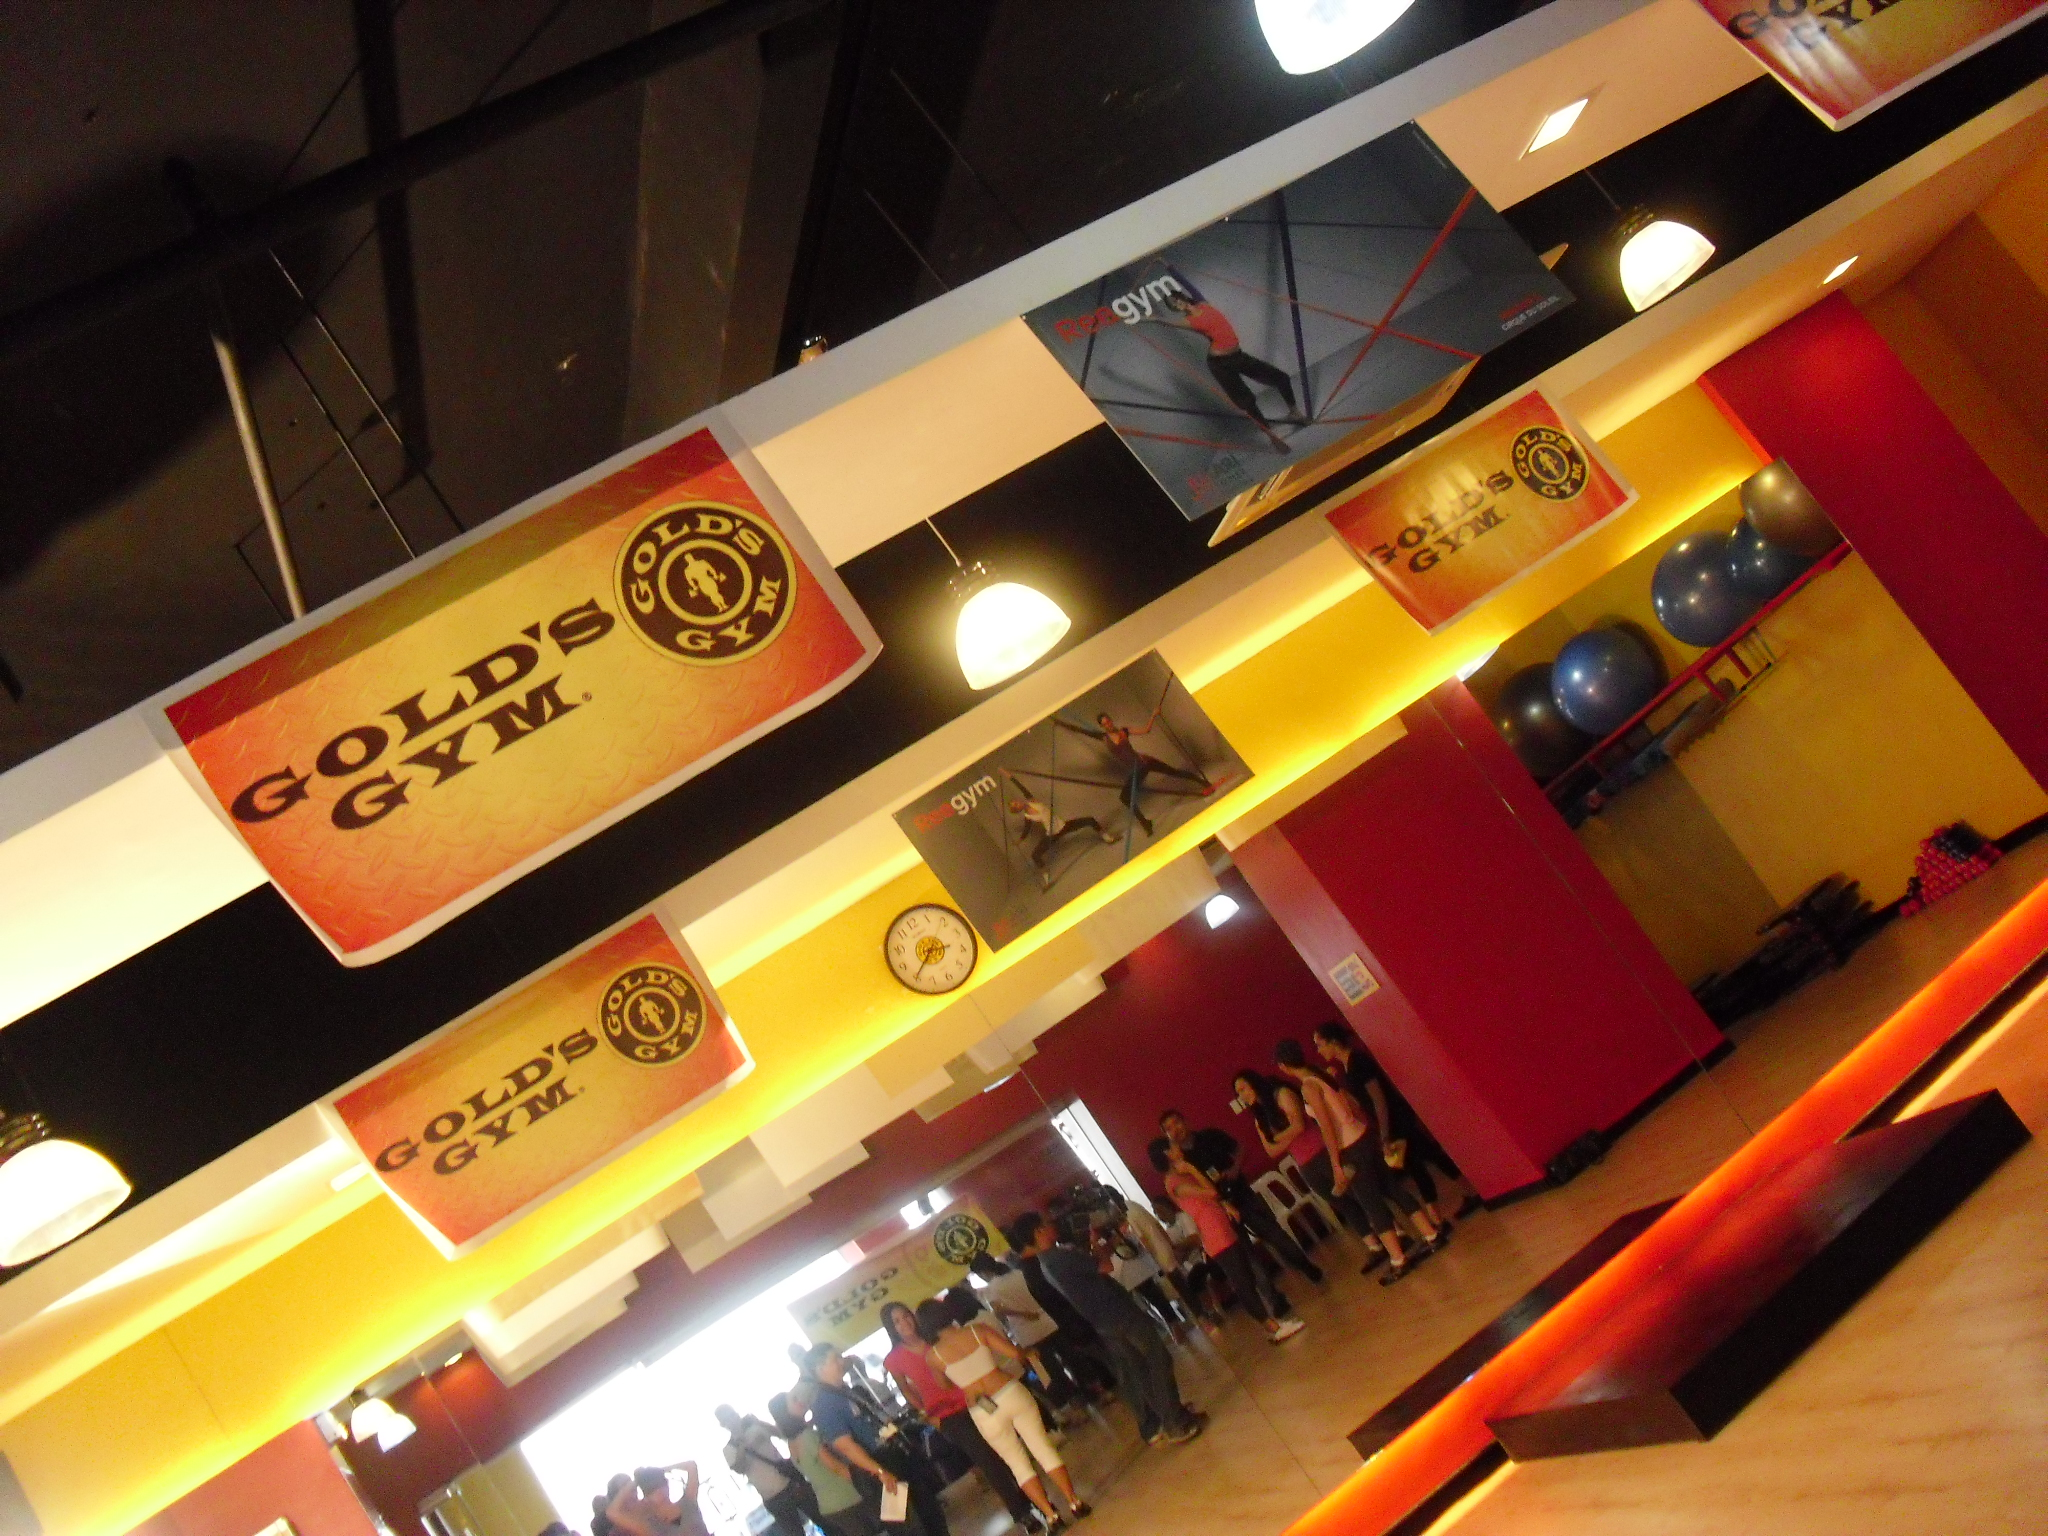 Reebok Jukari launch: Gold's Gym